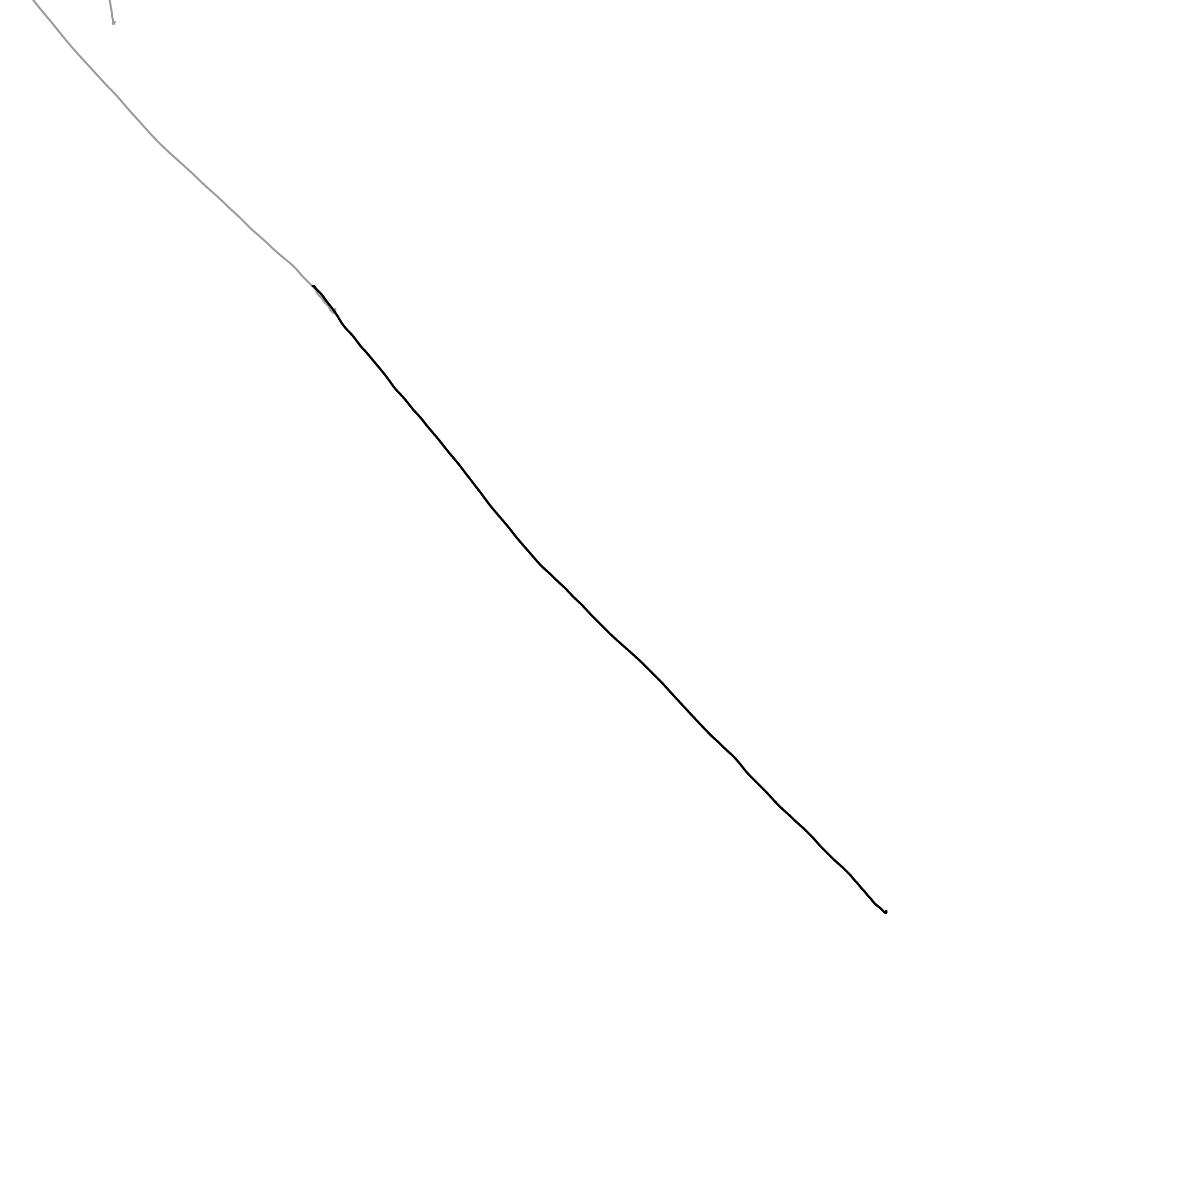 BAAAM drawing#45 lat:50.2346534729003900lng: 17.0227355957031250